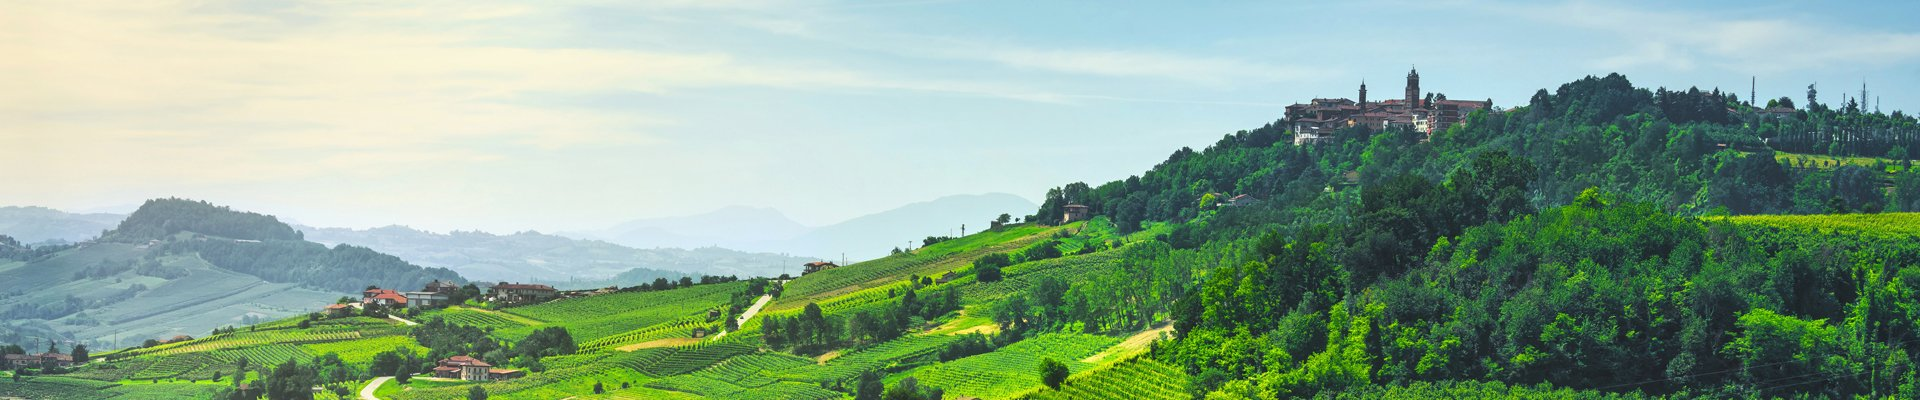 La Morra in the Piedmont Region of Italy